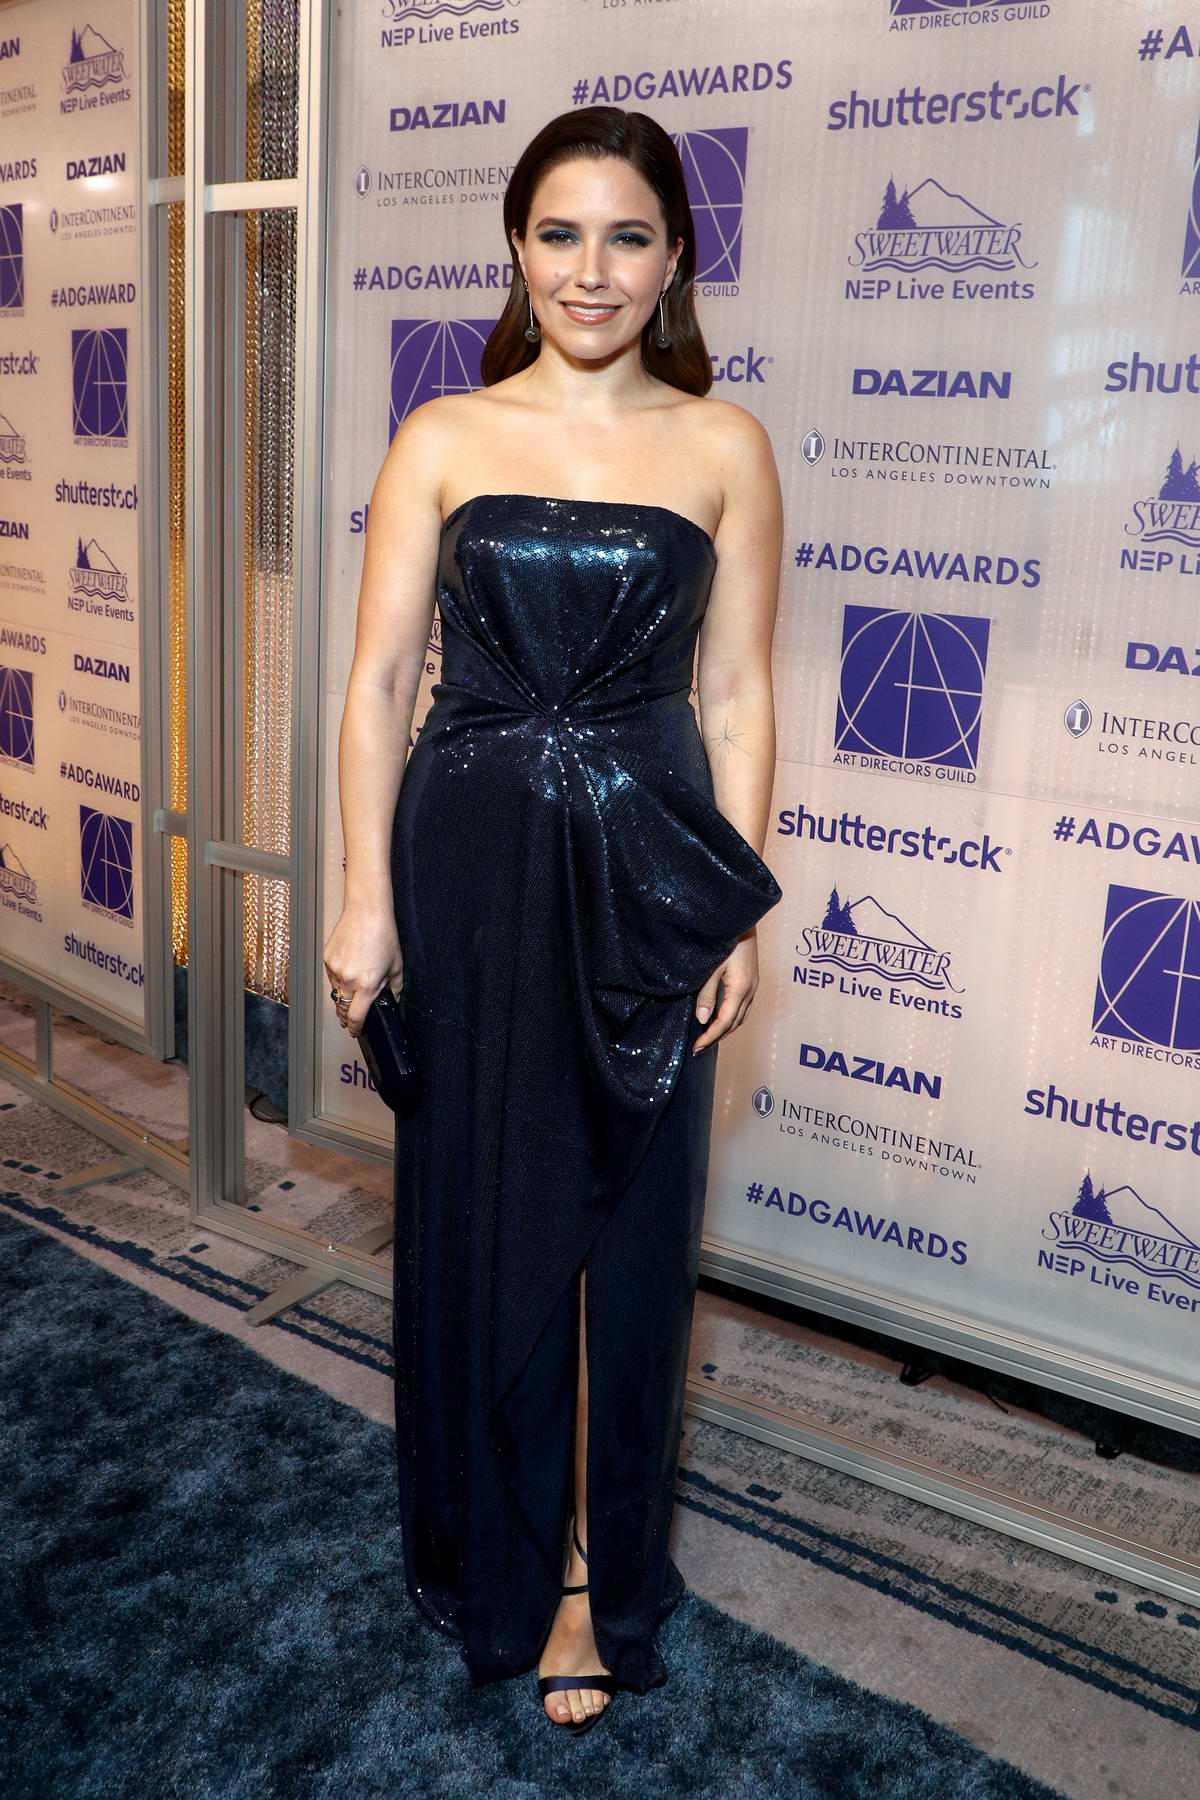 Sophia Bush attends the 23rd Annual Art Directors Guild Awards in Los Angeles